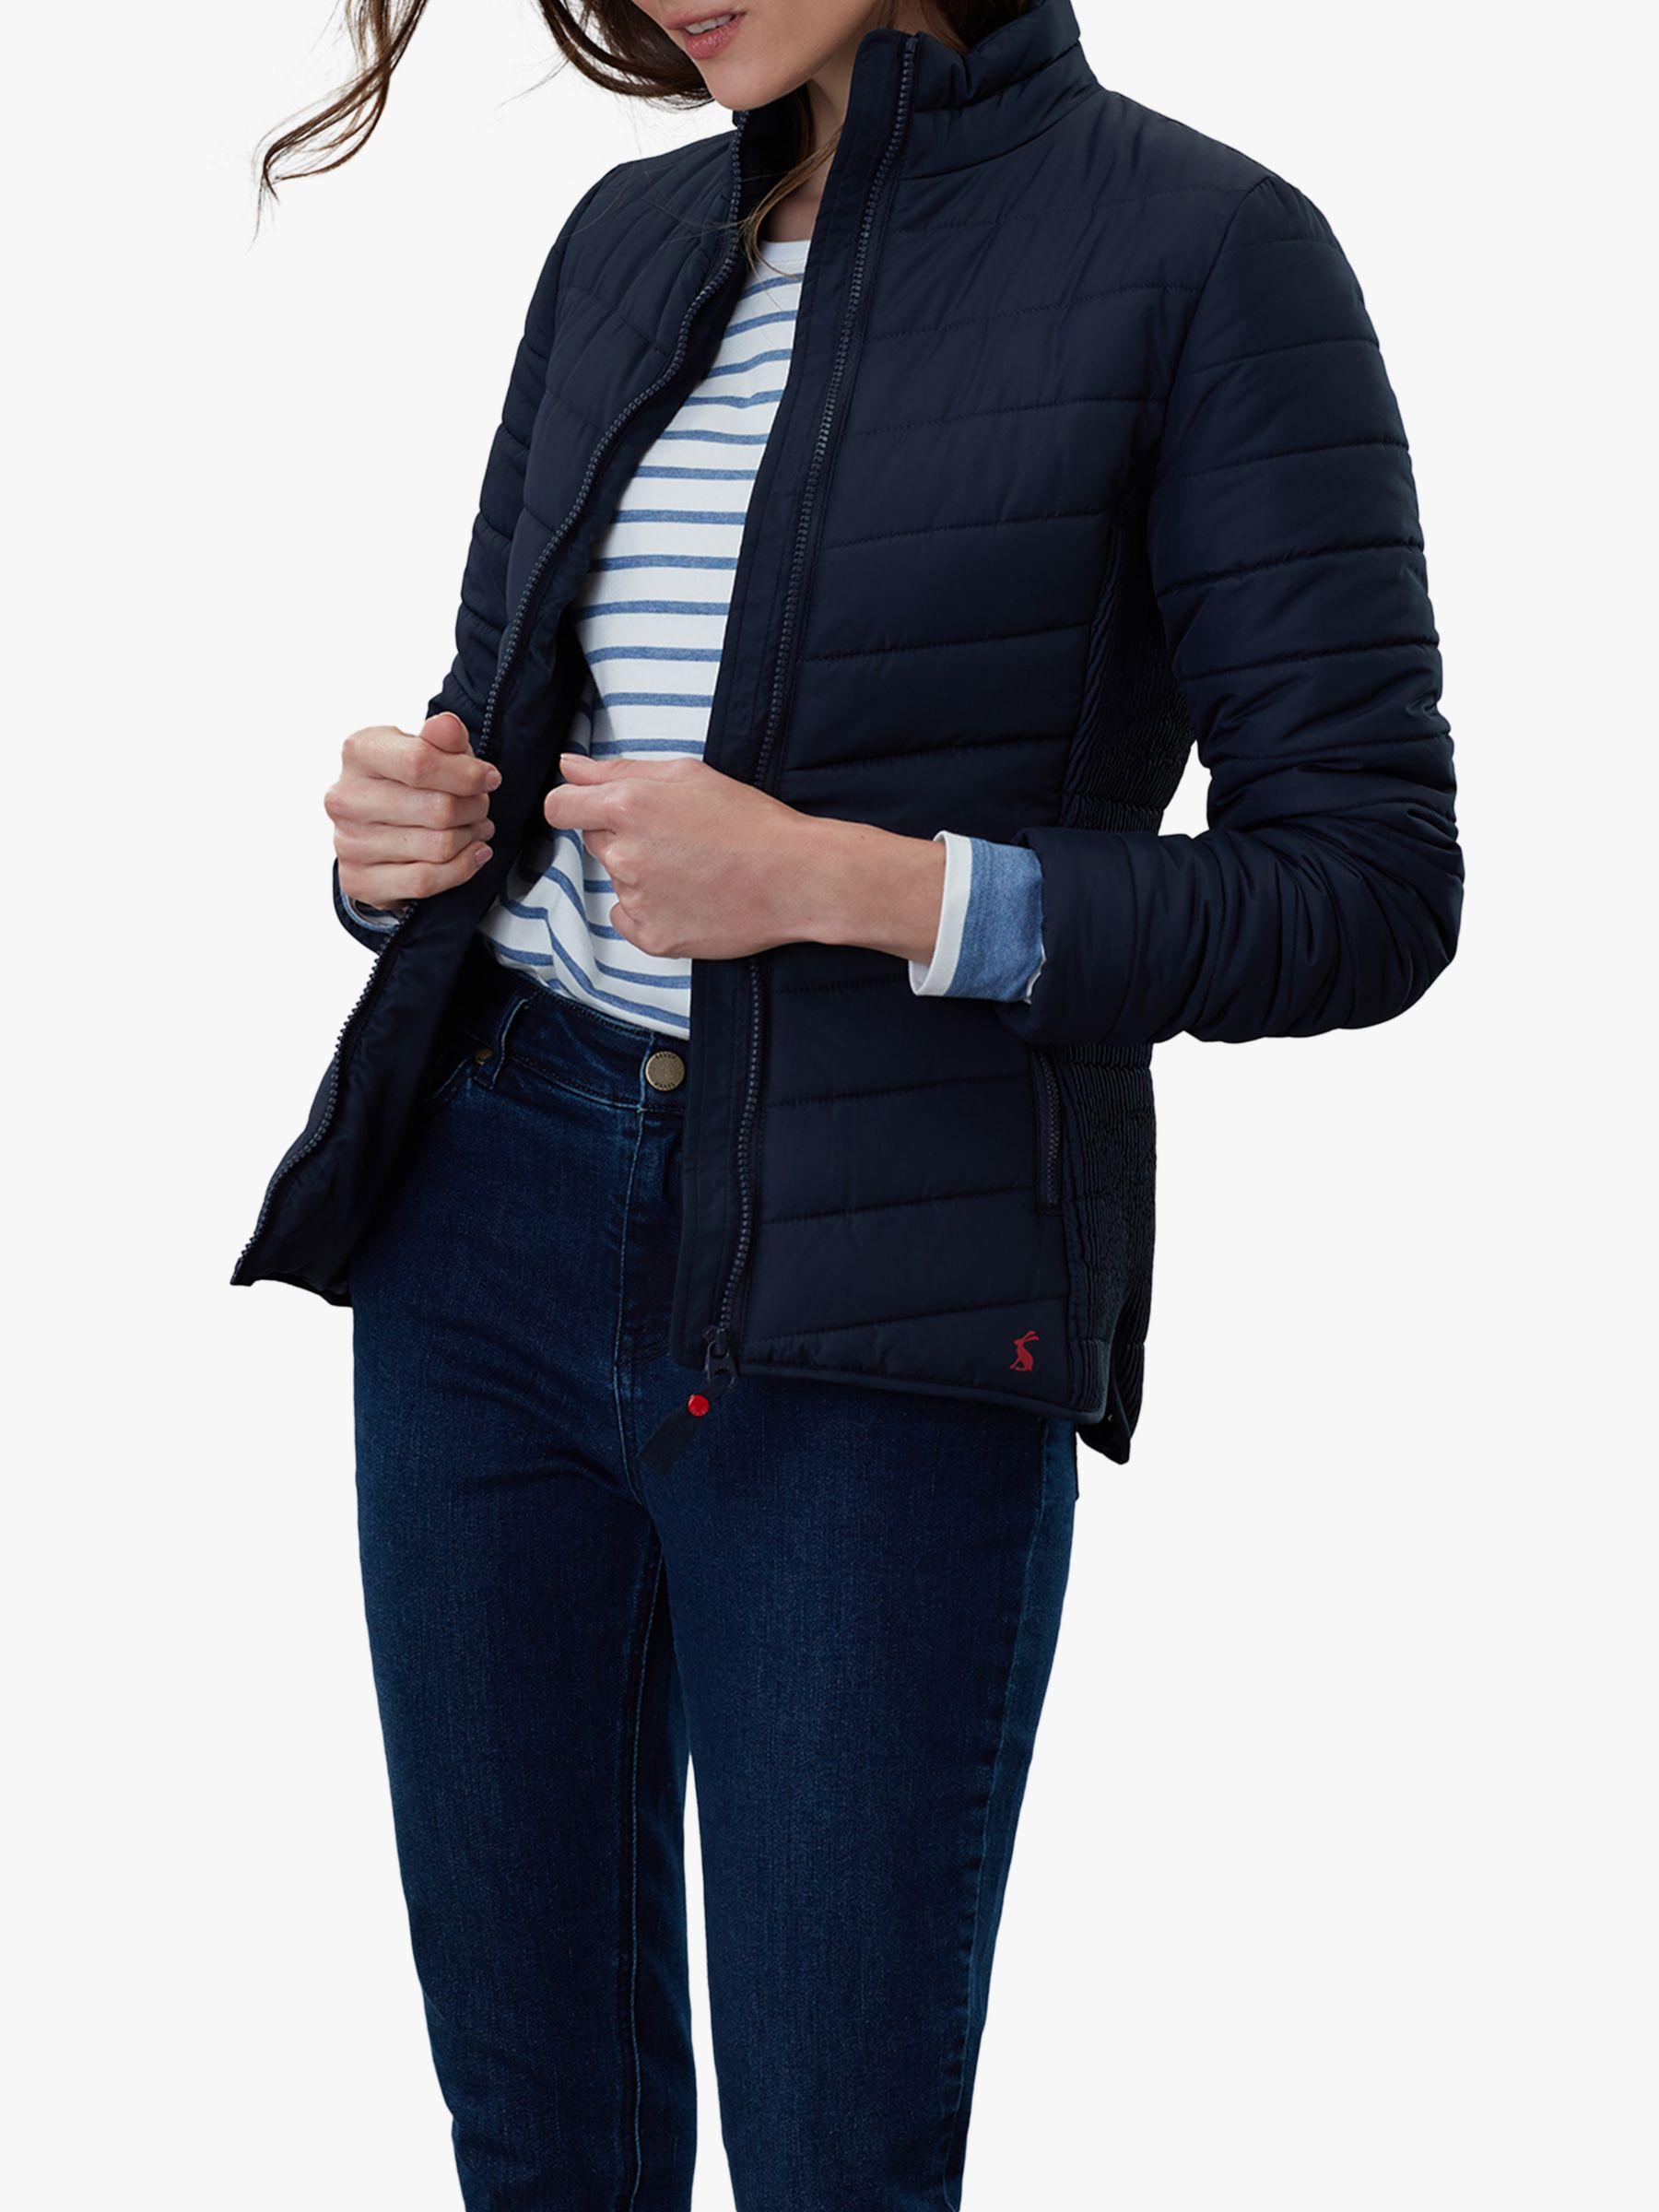 Joules Joules Harrogate Padded Jacket